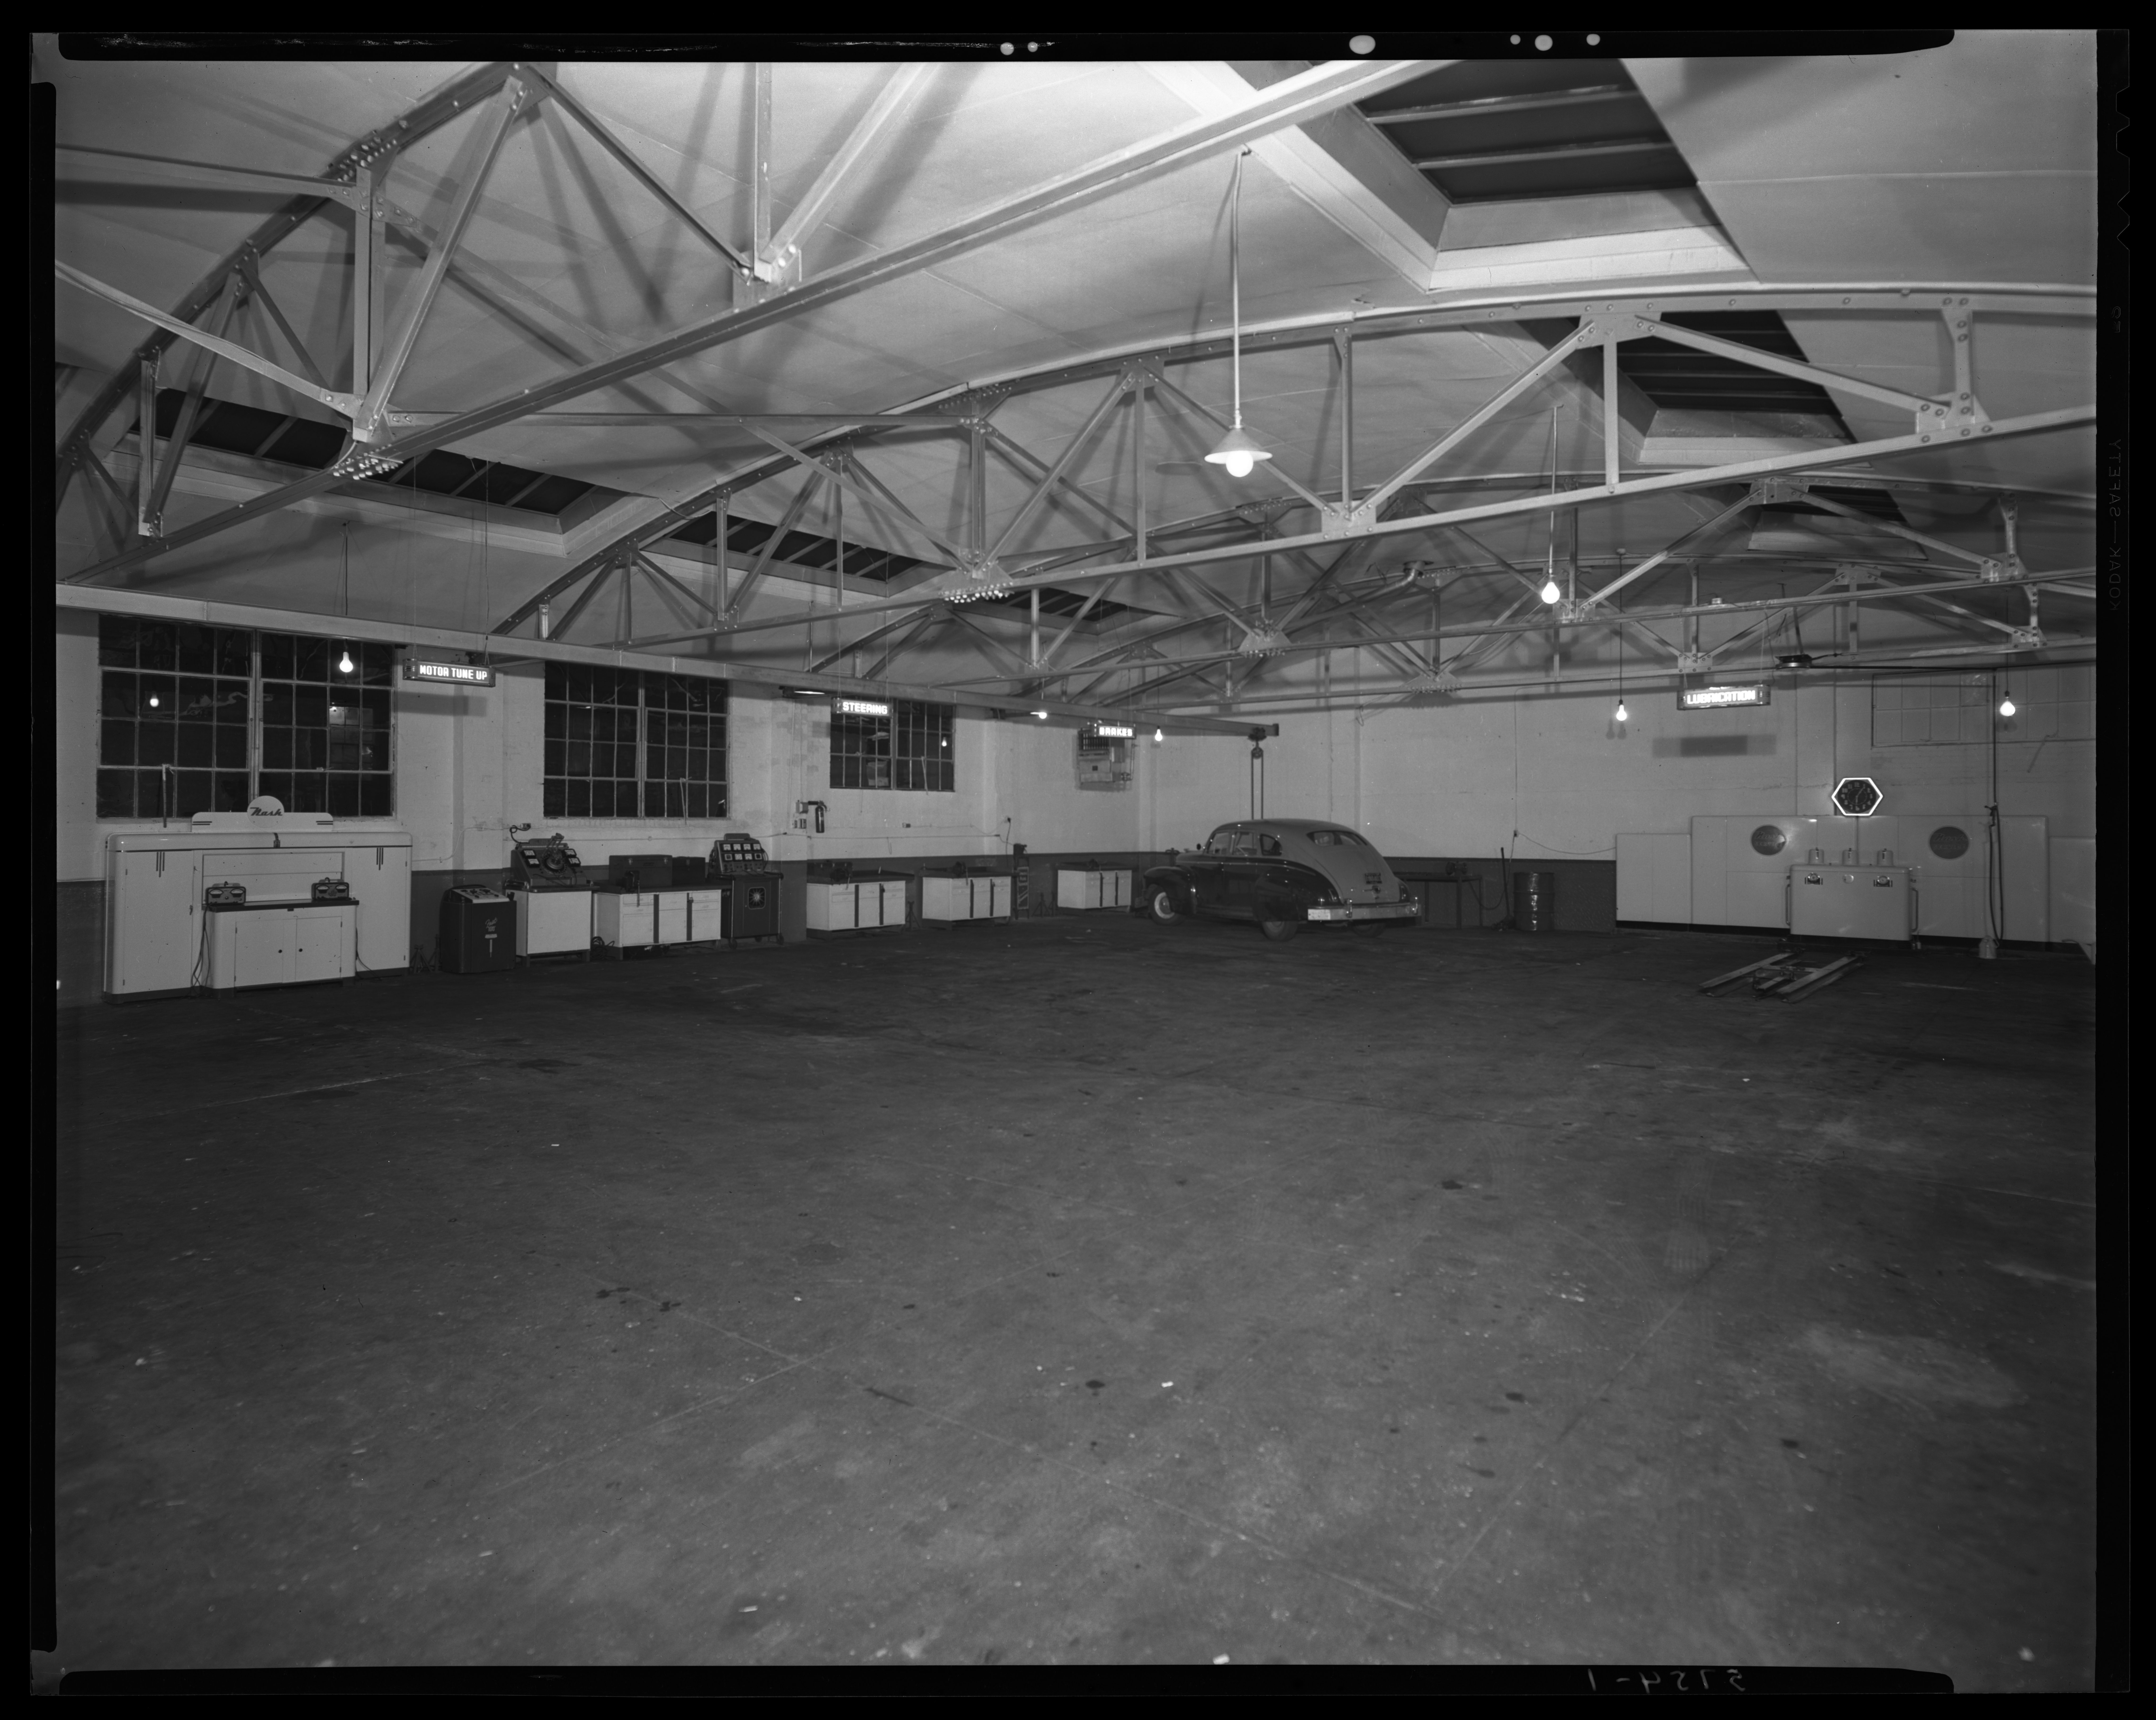 L.R. Cooke Chevrolet Motor Company, 255 East Main; interior of garage, 1947